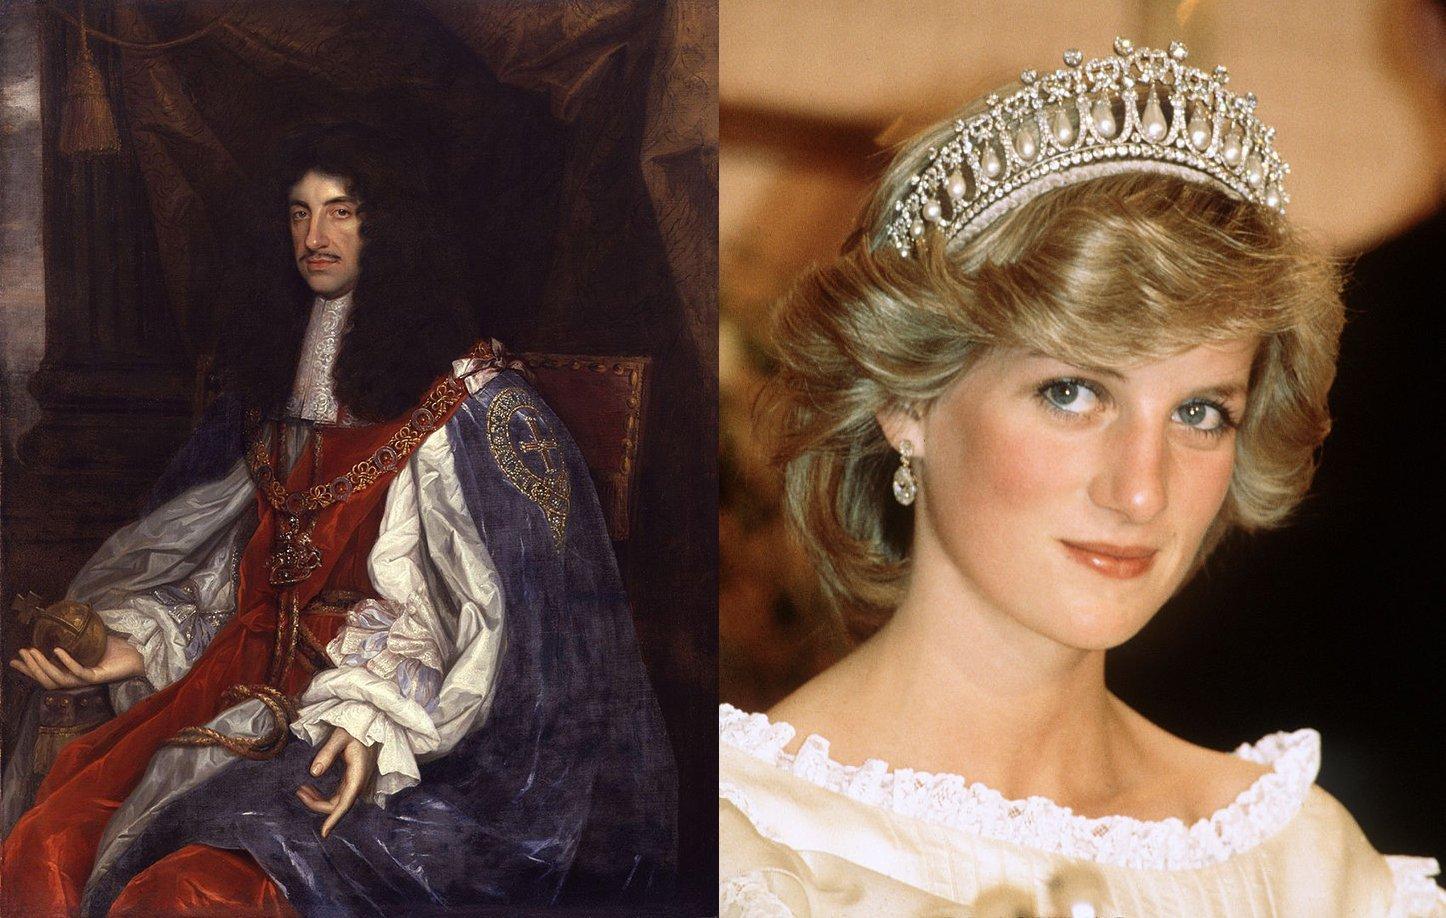 King Charles II and Princess Diana. I Image: Getty Images.